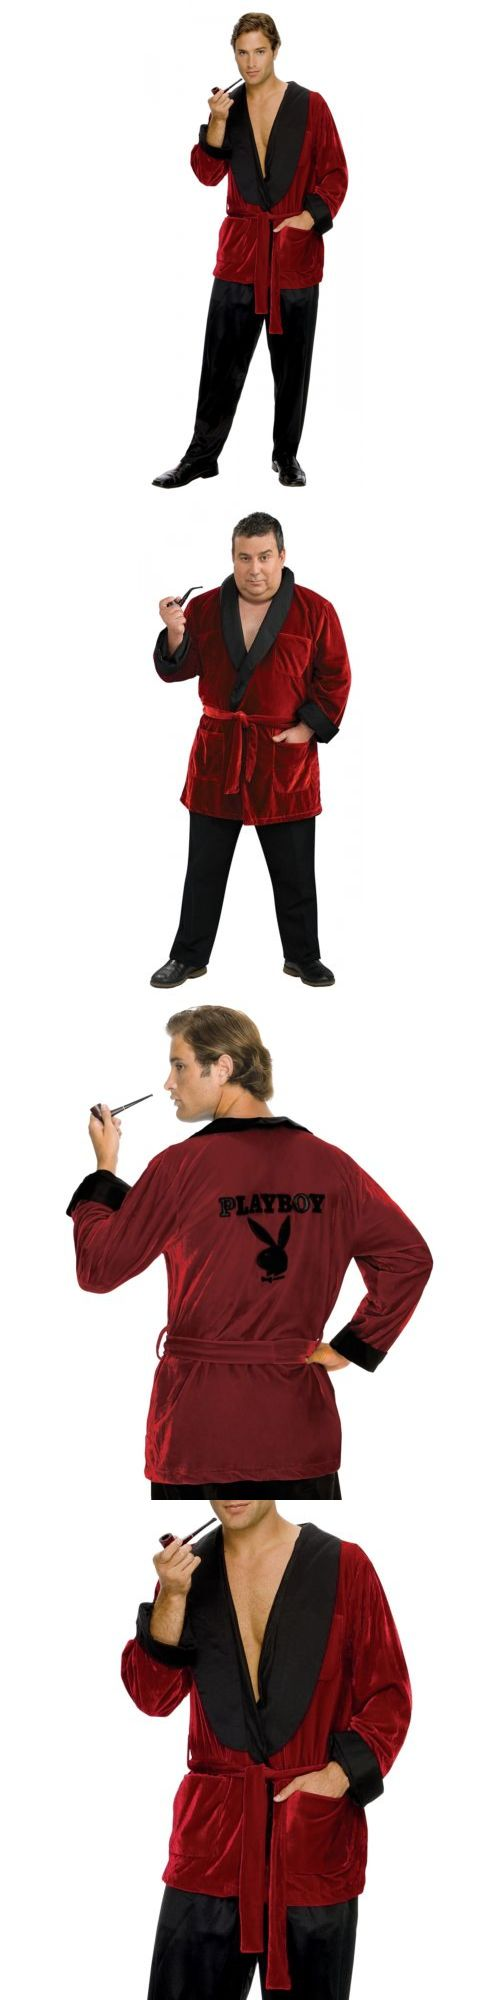 Halloween Costumes Men: Hugh Hefner Costume Adult Smoking Jacket Playboy Halloween Fancy Dress -> BUY IT NOW ONLY: $47.29 on eBay!